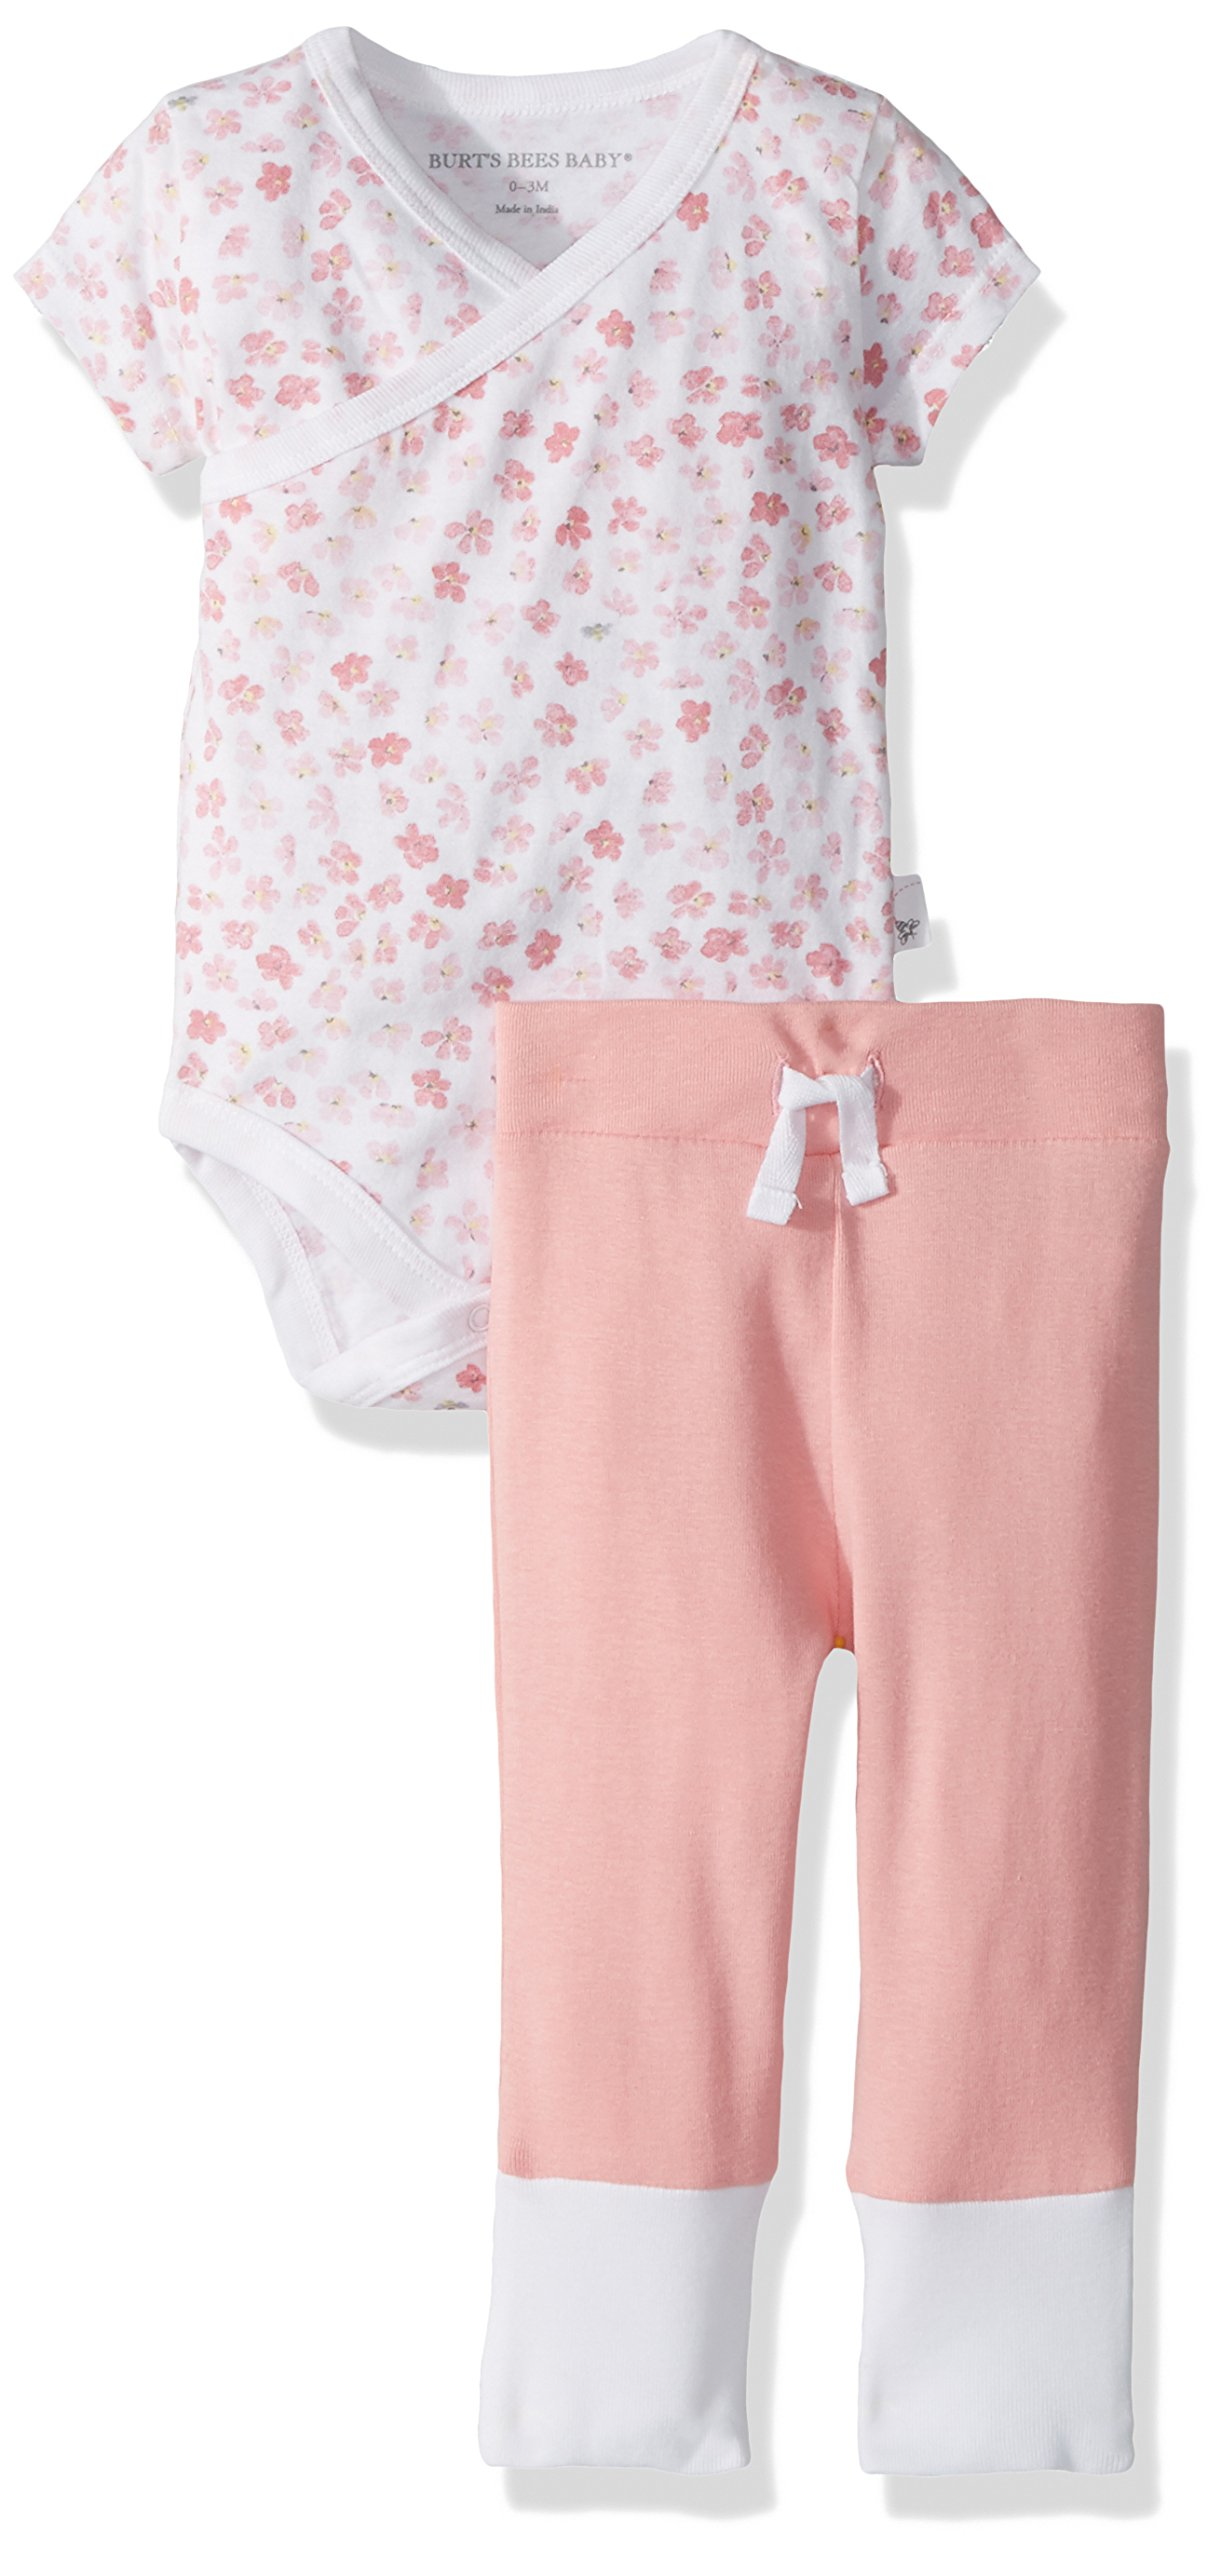 Burt's Bees Baby - Unisex Baby Bodysuit & Pant Set, 100% Organic Cotton